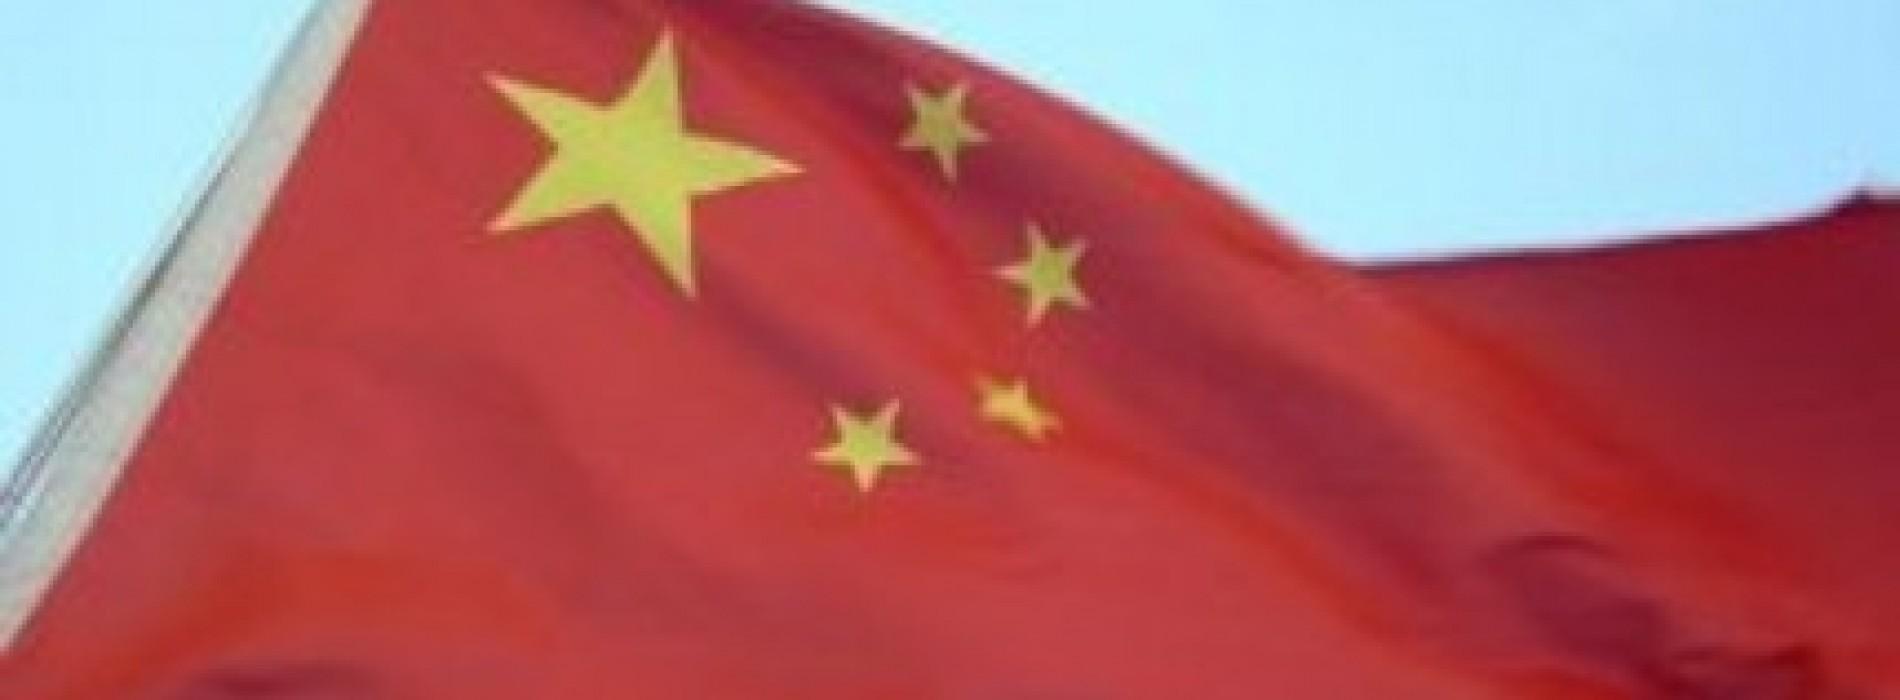 China FDA slams 3 drug firms